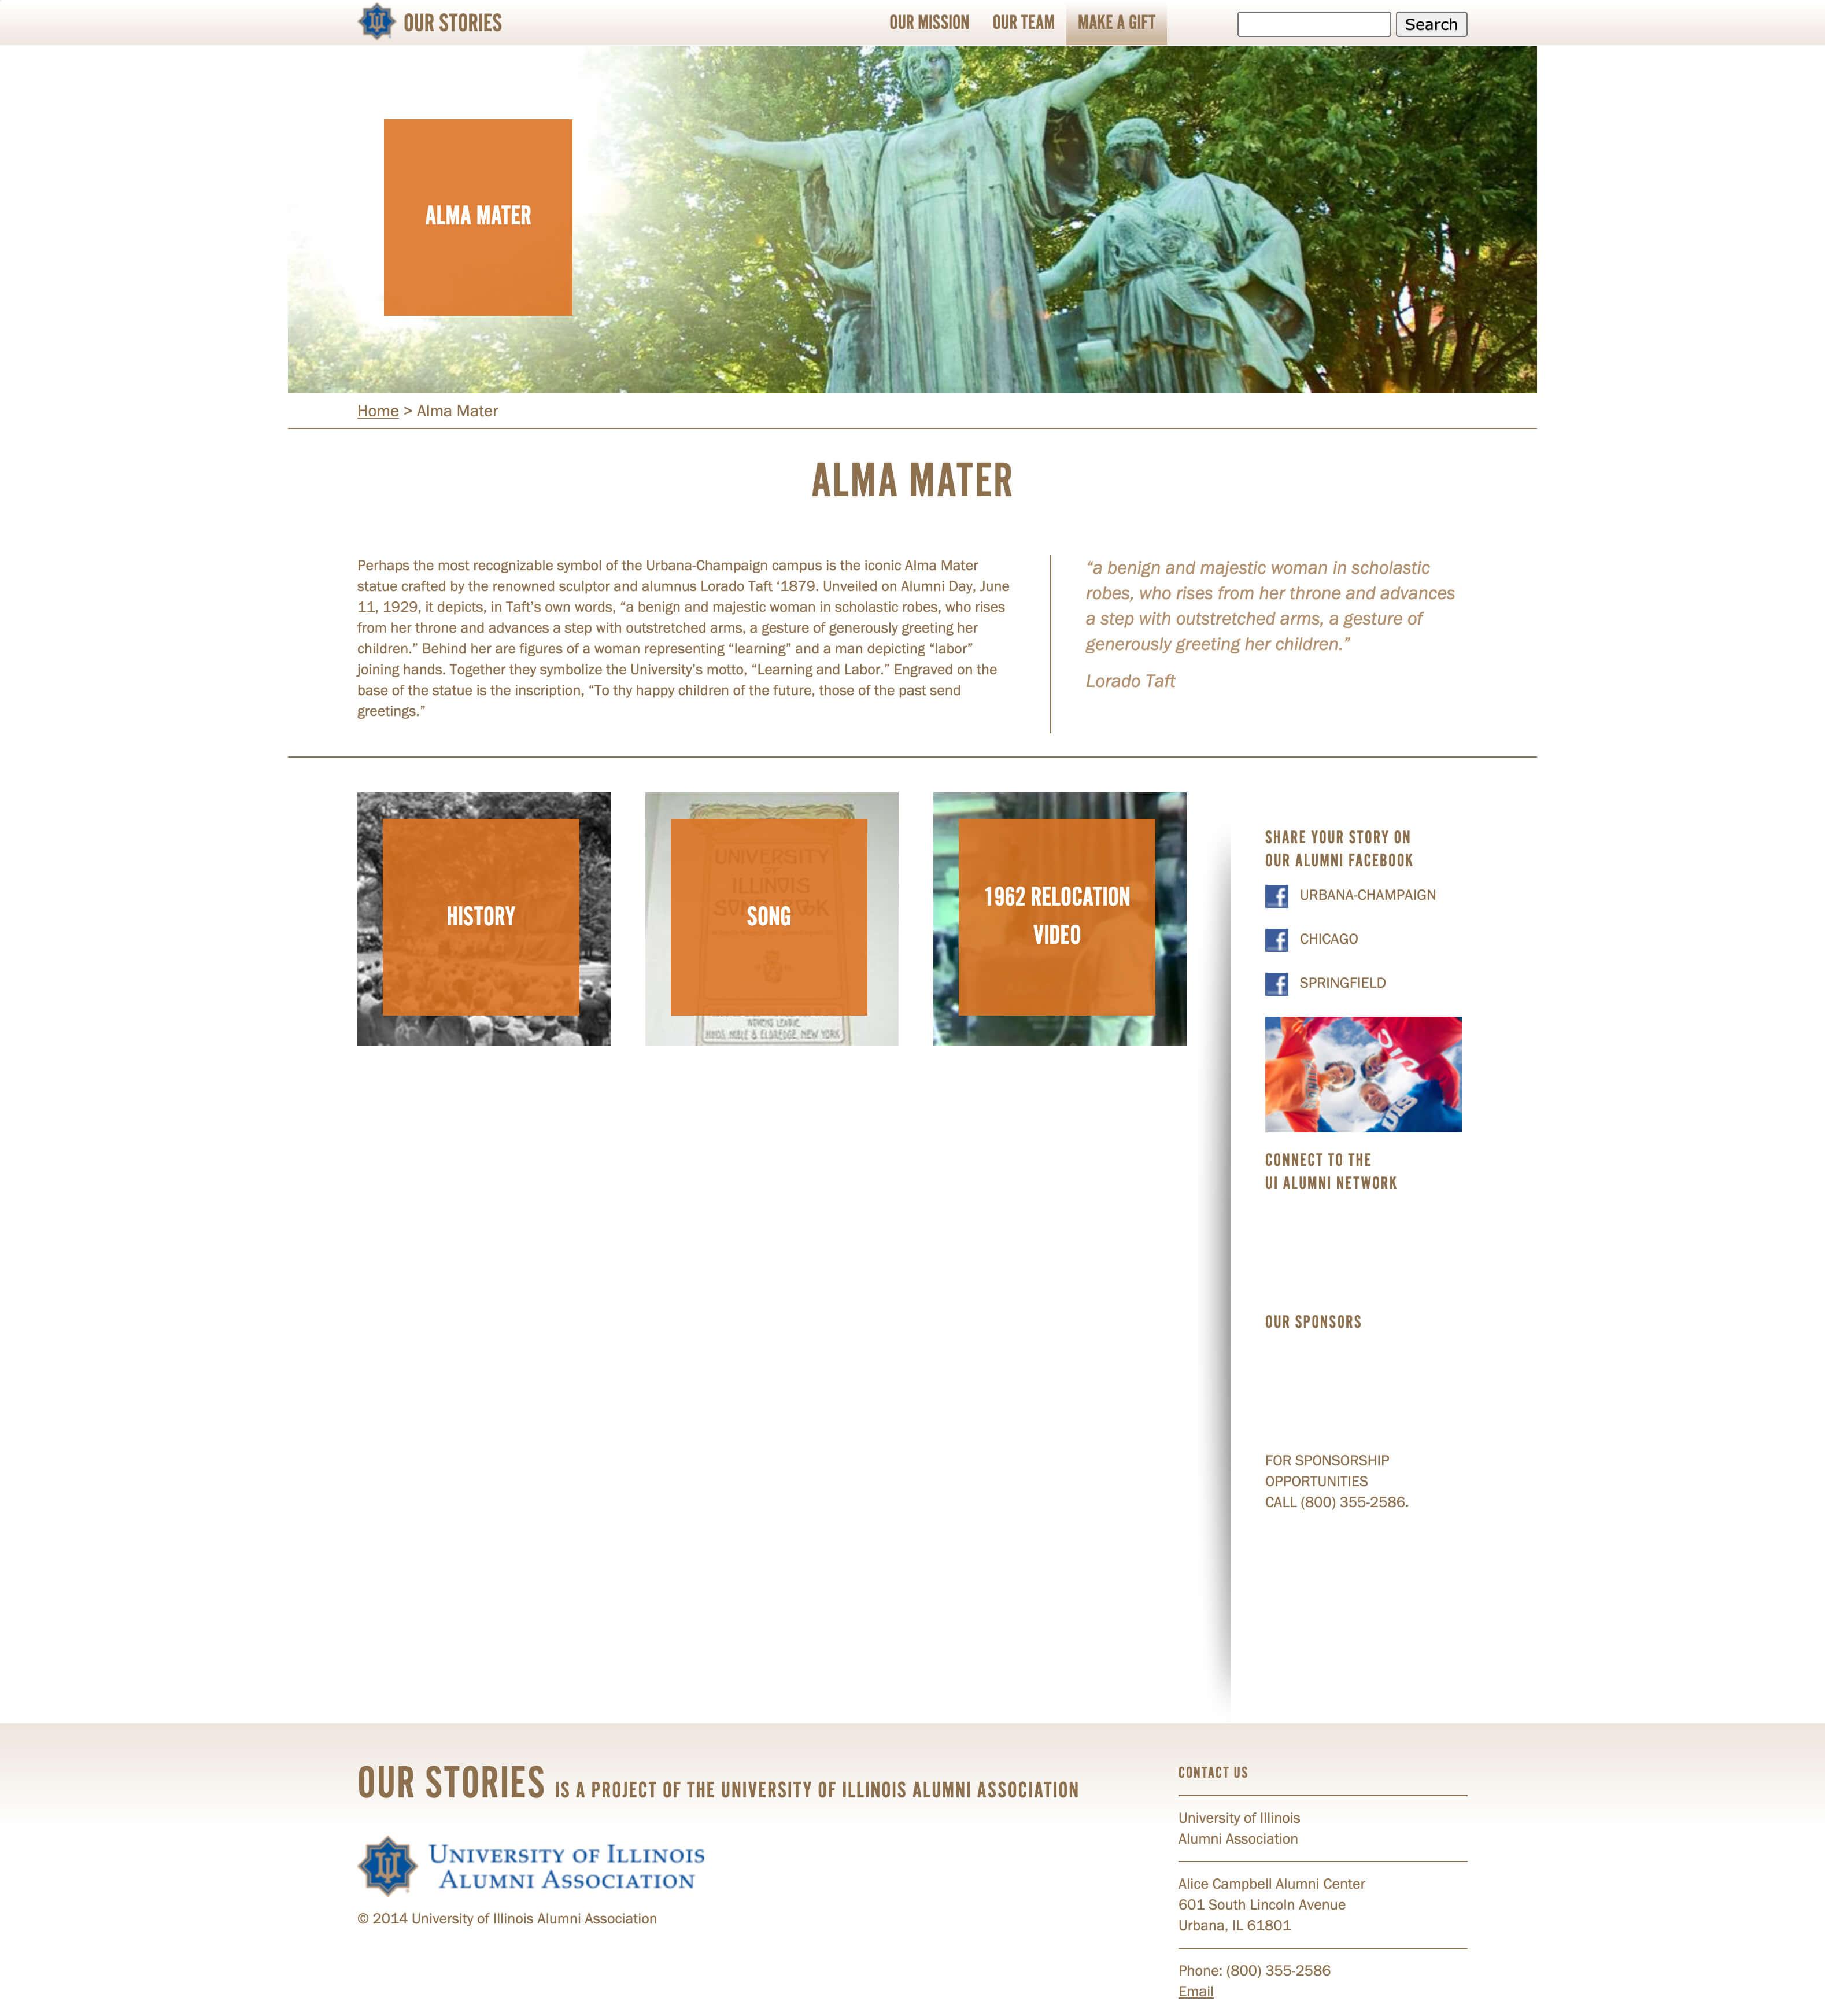 University of Illinois Alumni Association - Our Stories Website